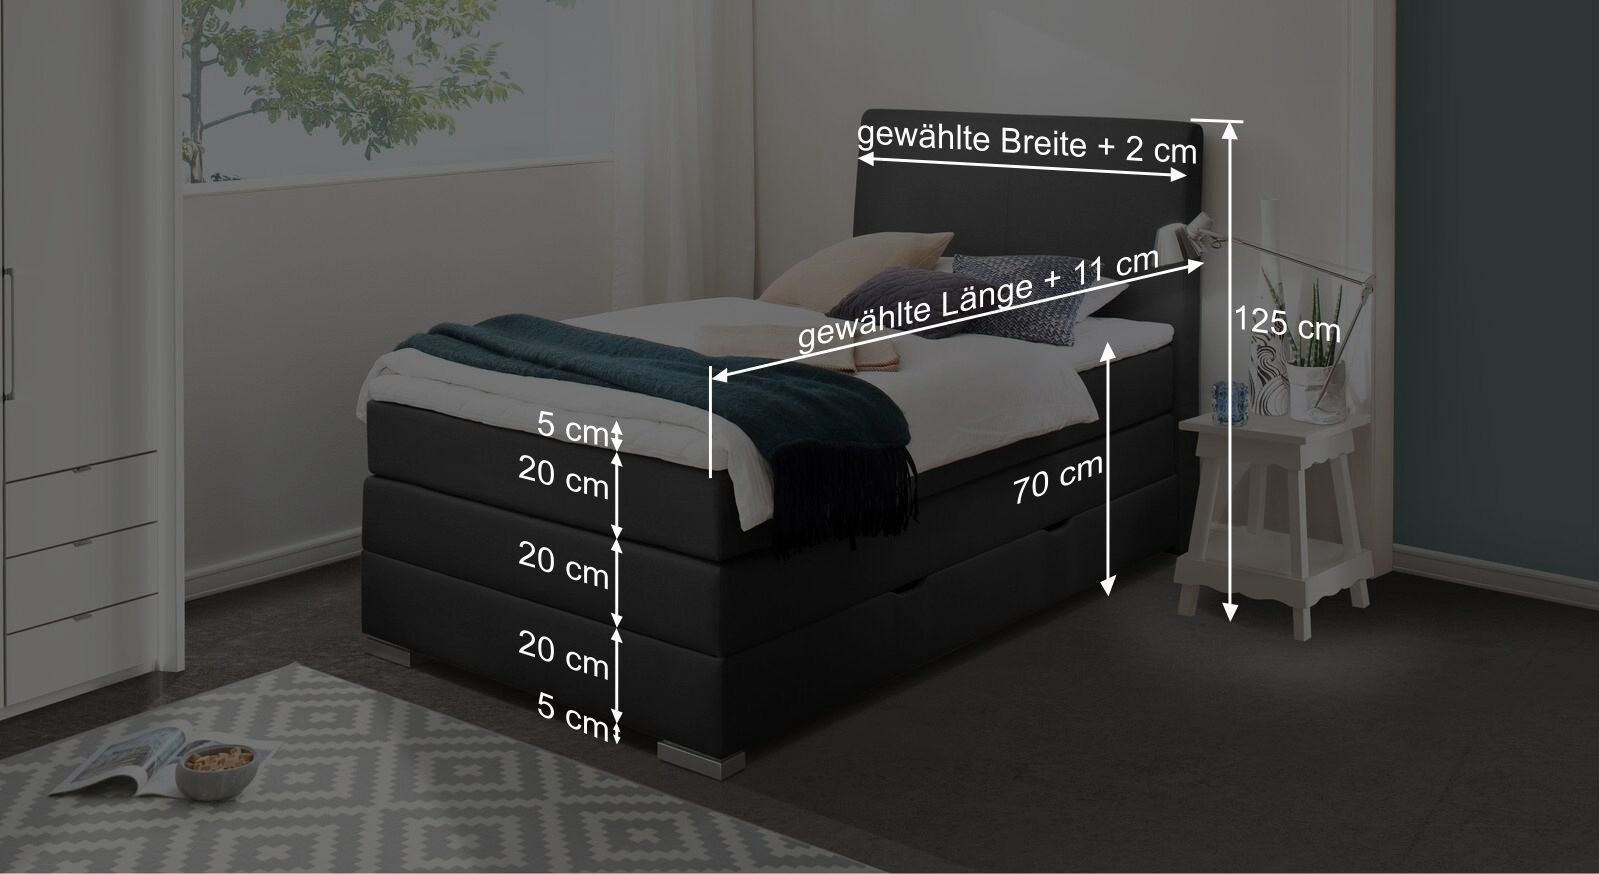 Bemaßungs-Skizze zum Bettkasten-Boxspringbett Ivetta